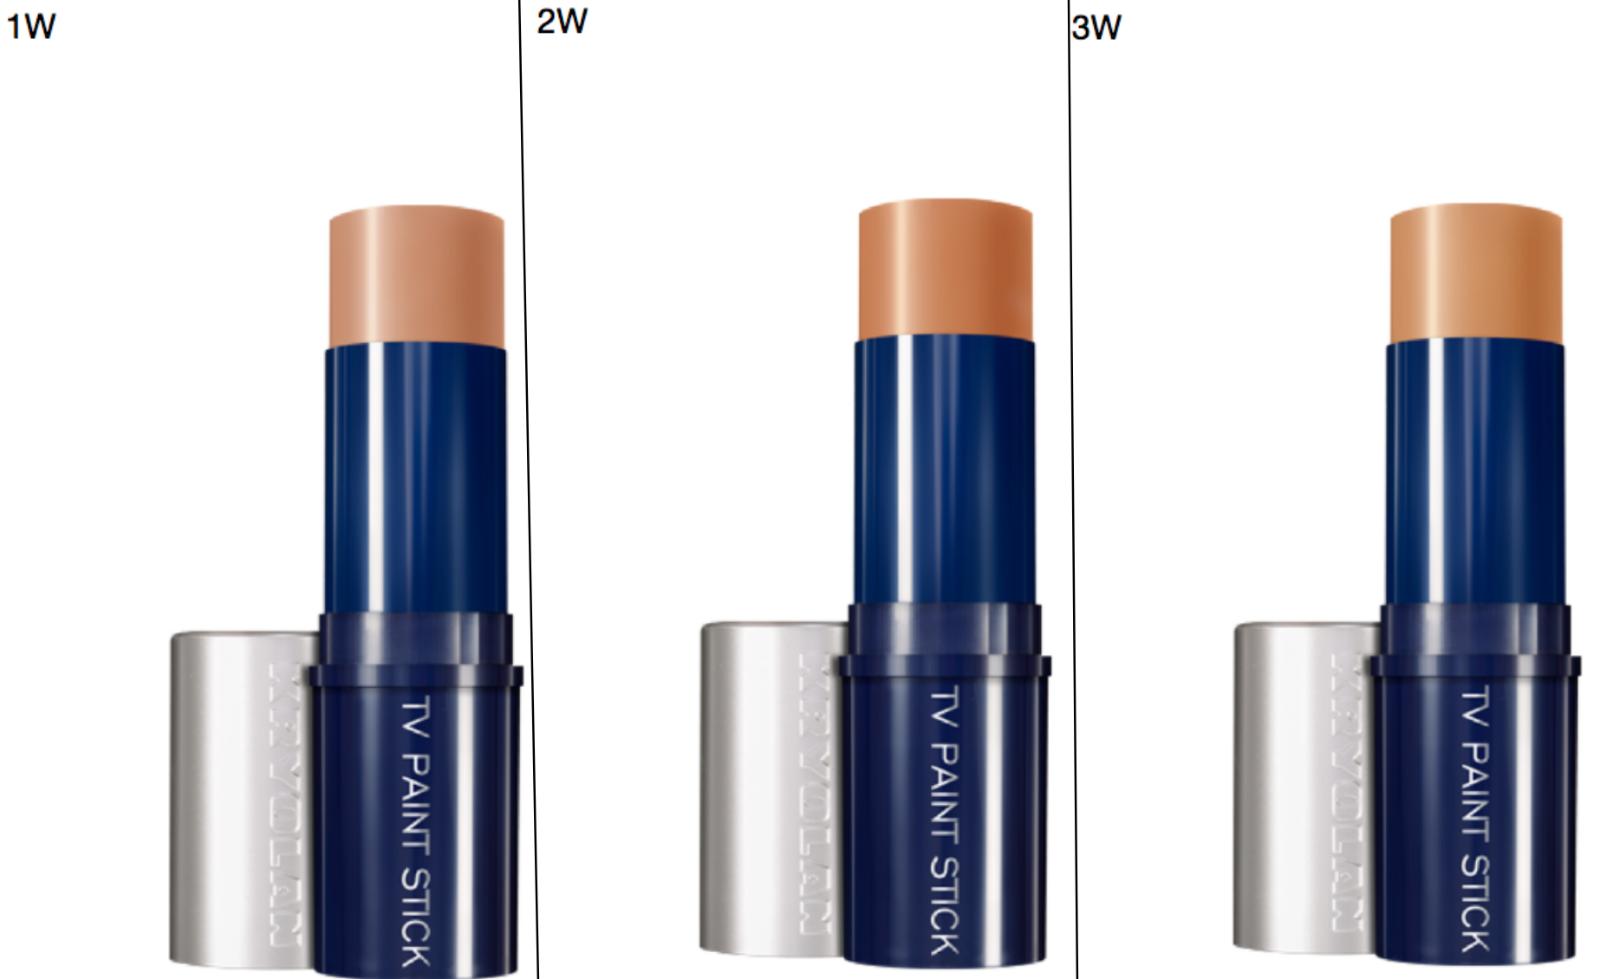 Kryolan 5047 TV Paint Stick Cream Face Makeup Film Stage The